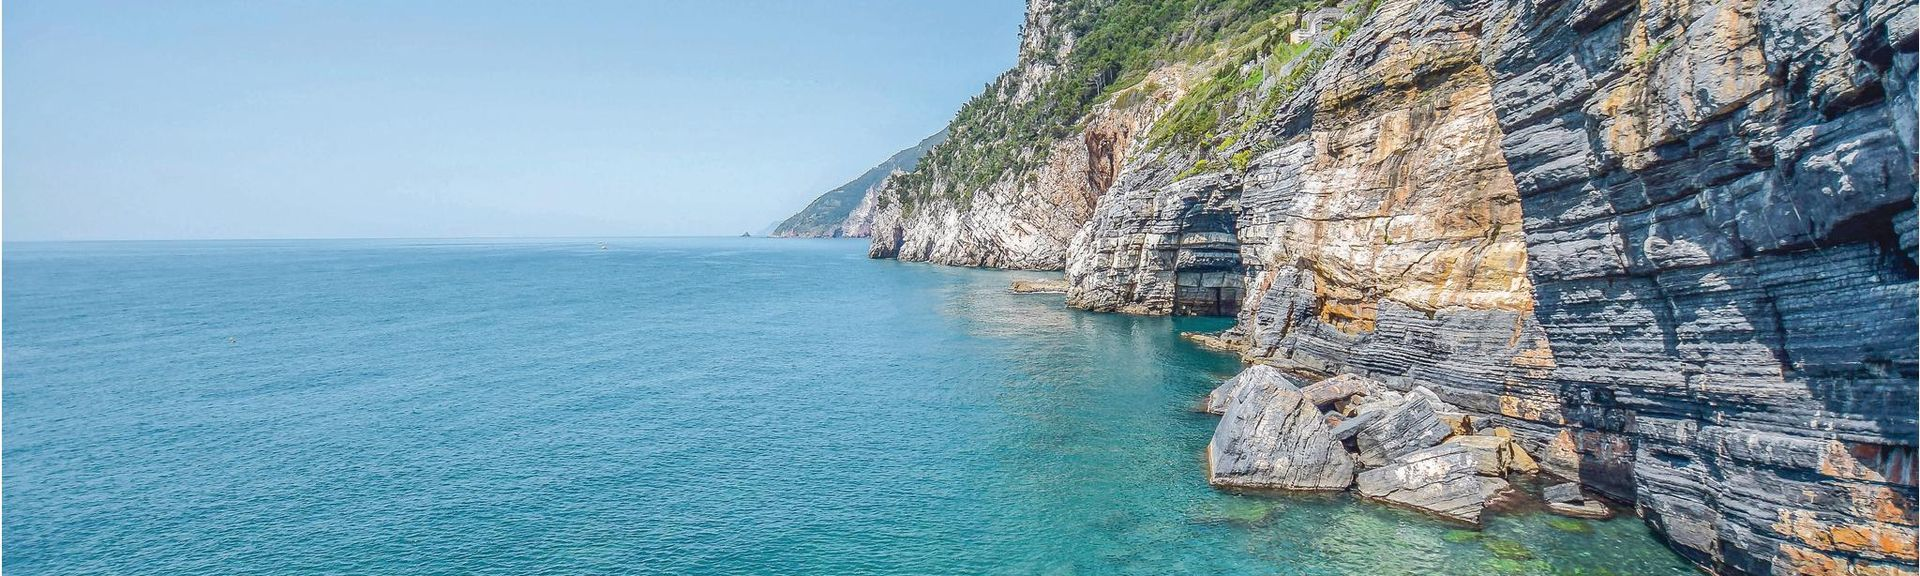 Sarzana, La Spezia, Liguria, Italy